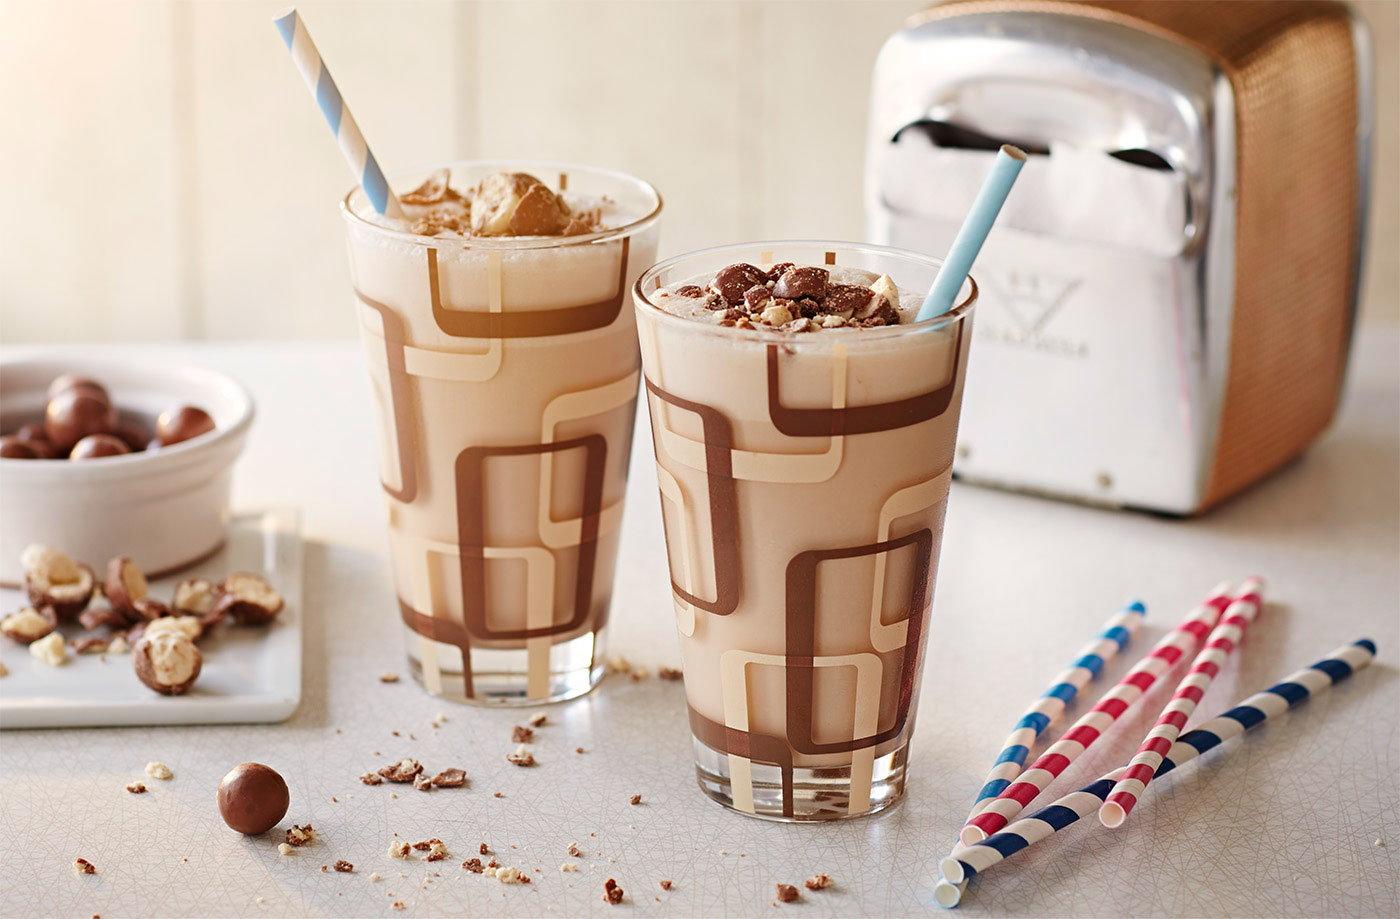 Malted vanilla ice cream milkshakes tesco real food malted vanilla ice cream milkshakes recipe ccuart Images